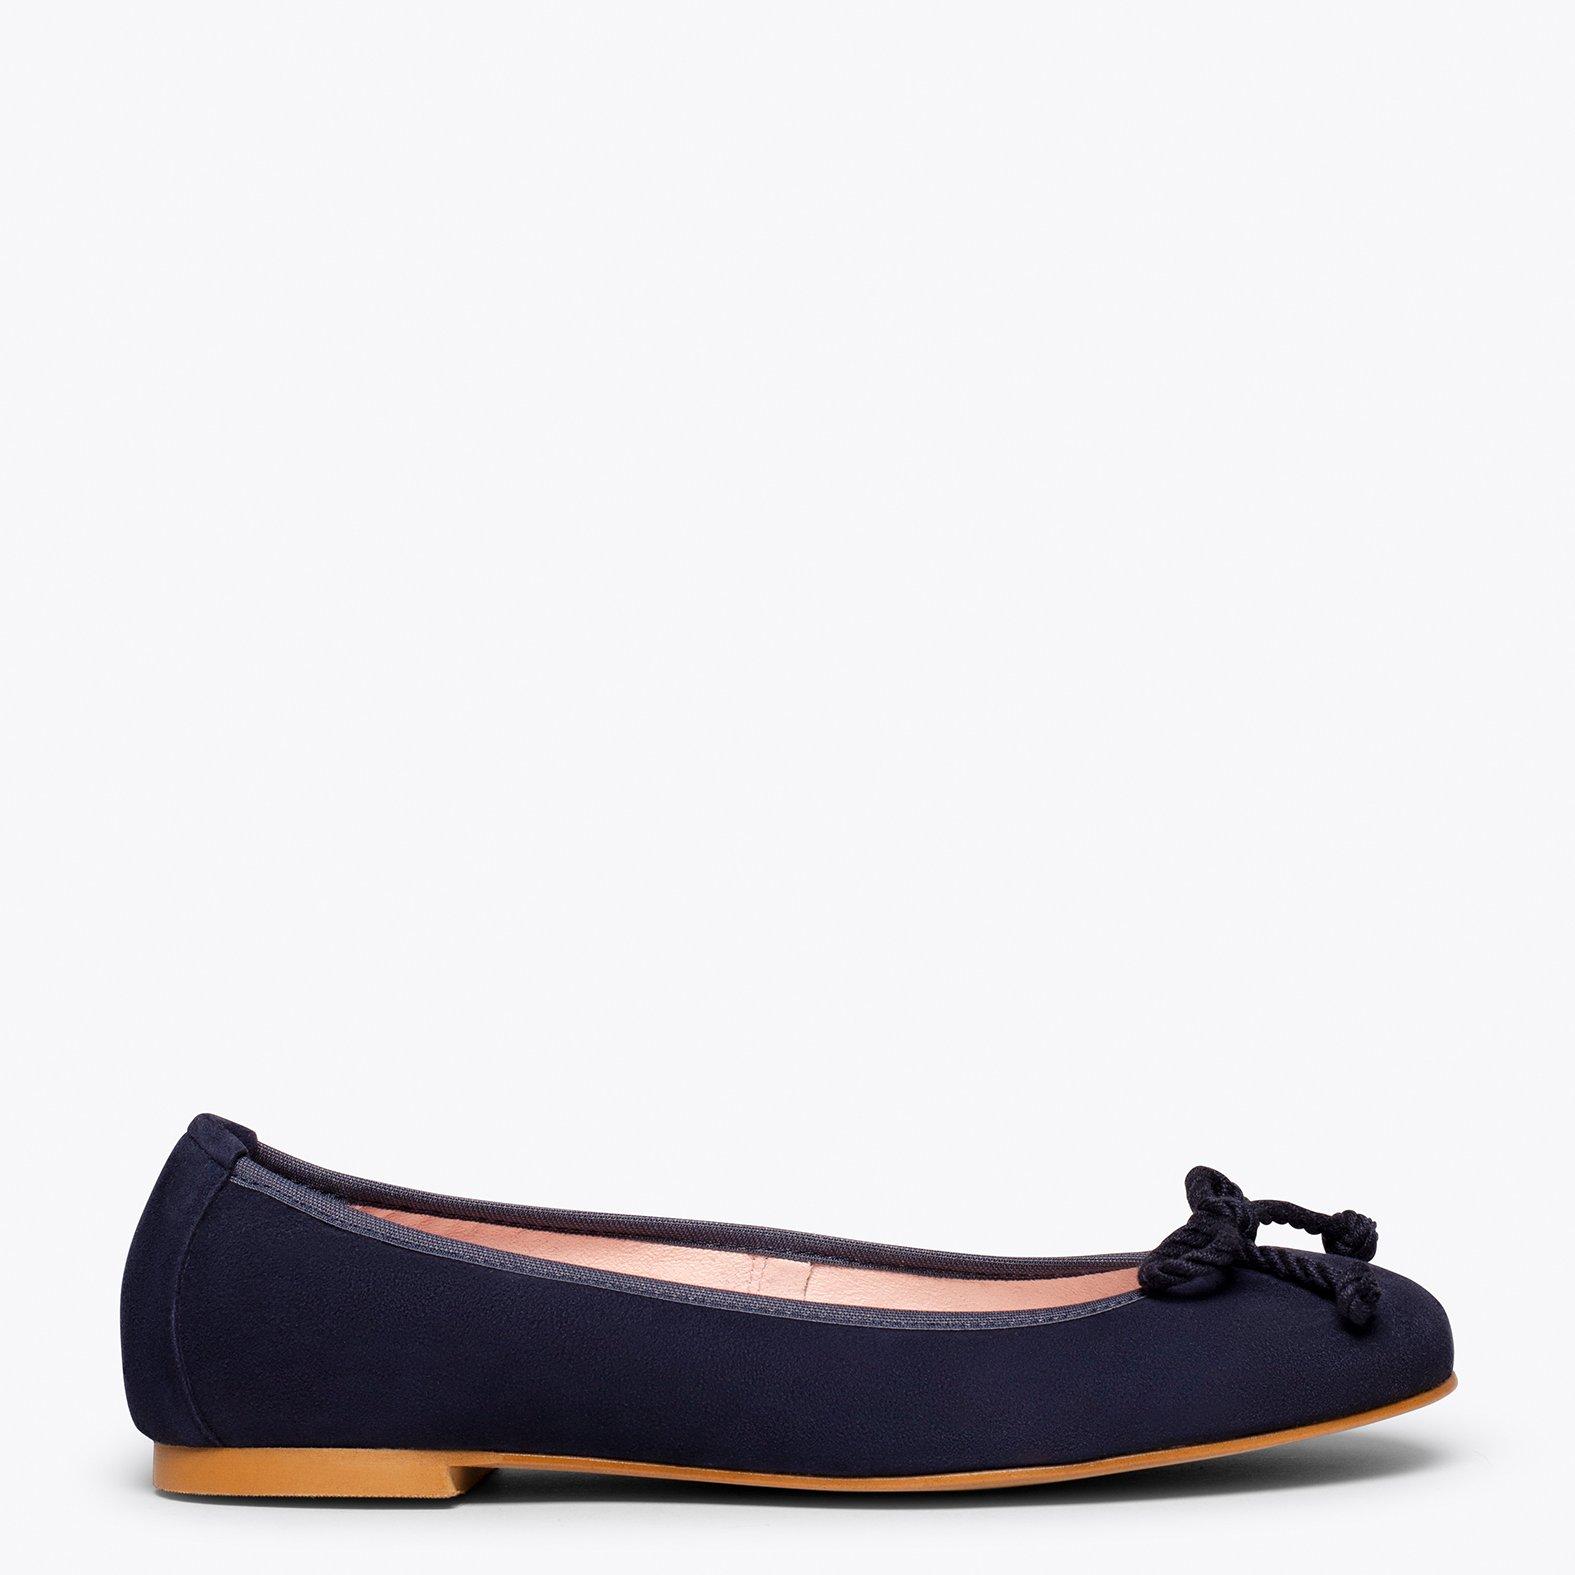 STILETTO Zapato con tacón fino NEGRO